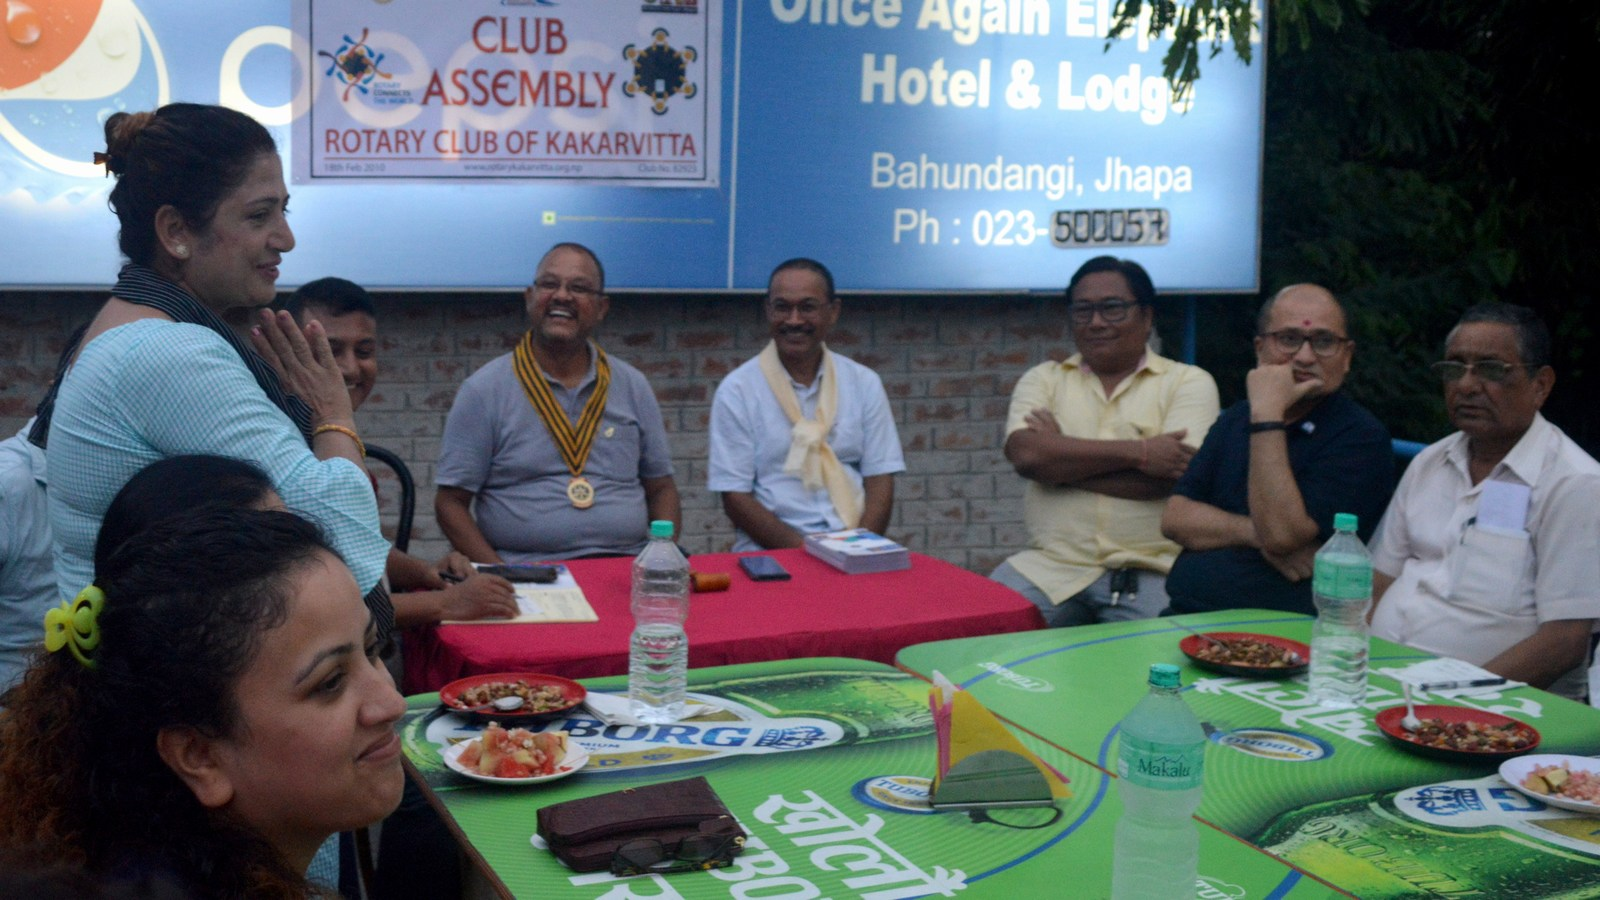 1st-Club-Assembly-2018-19-Rotary-Club-of-Kakarvitta-34